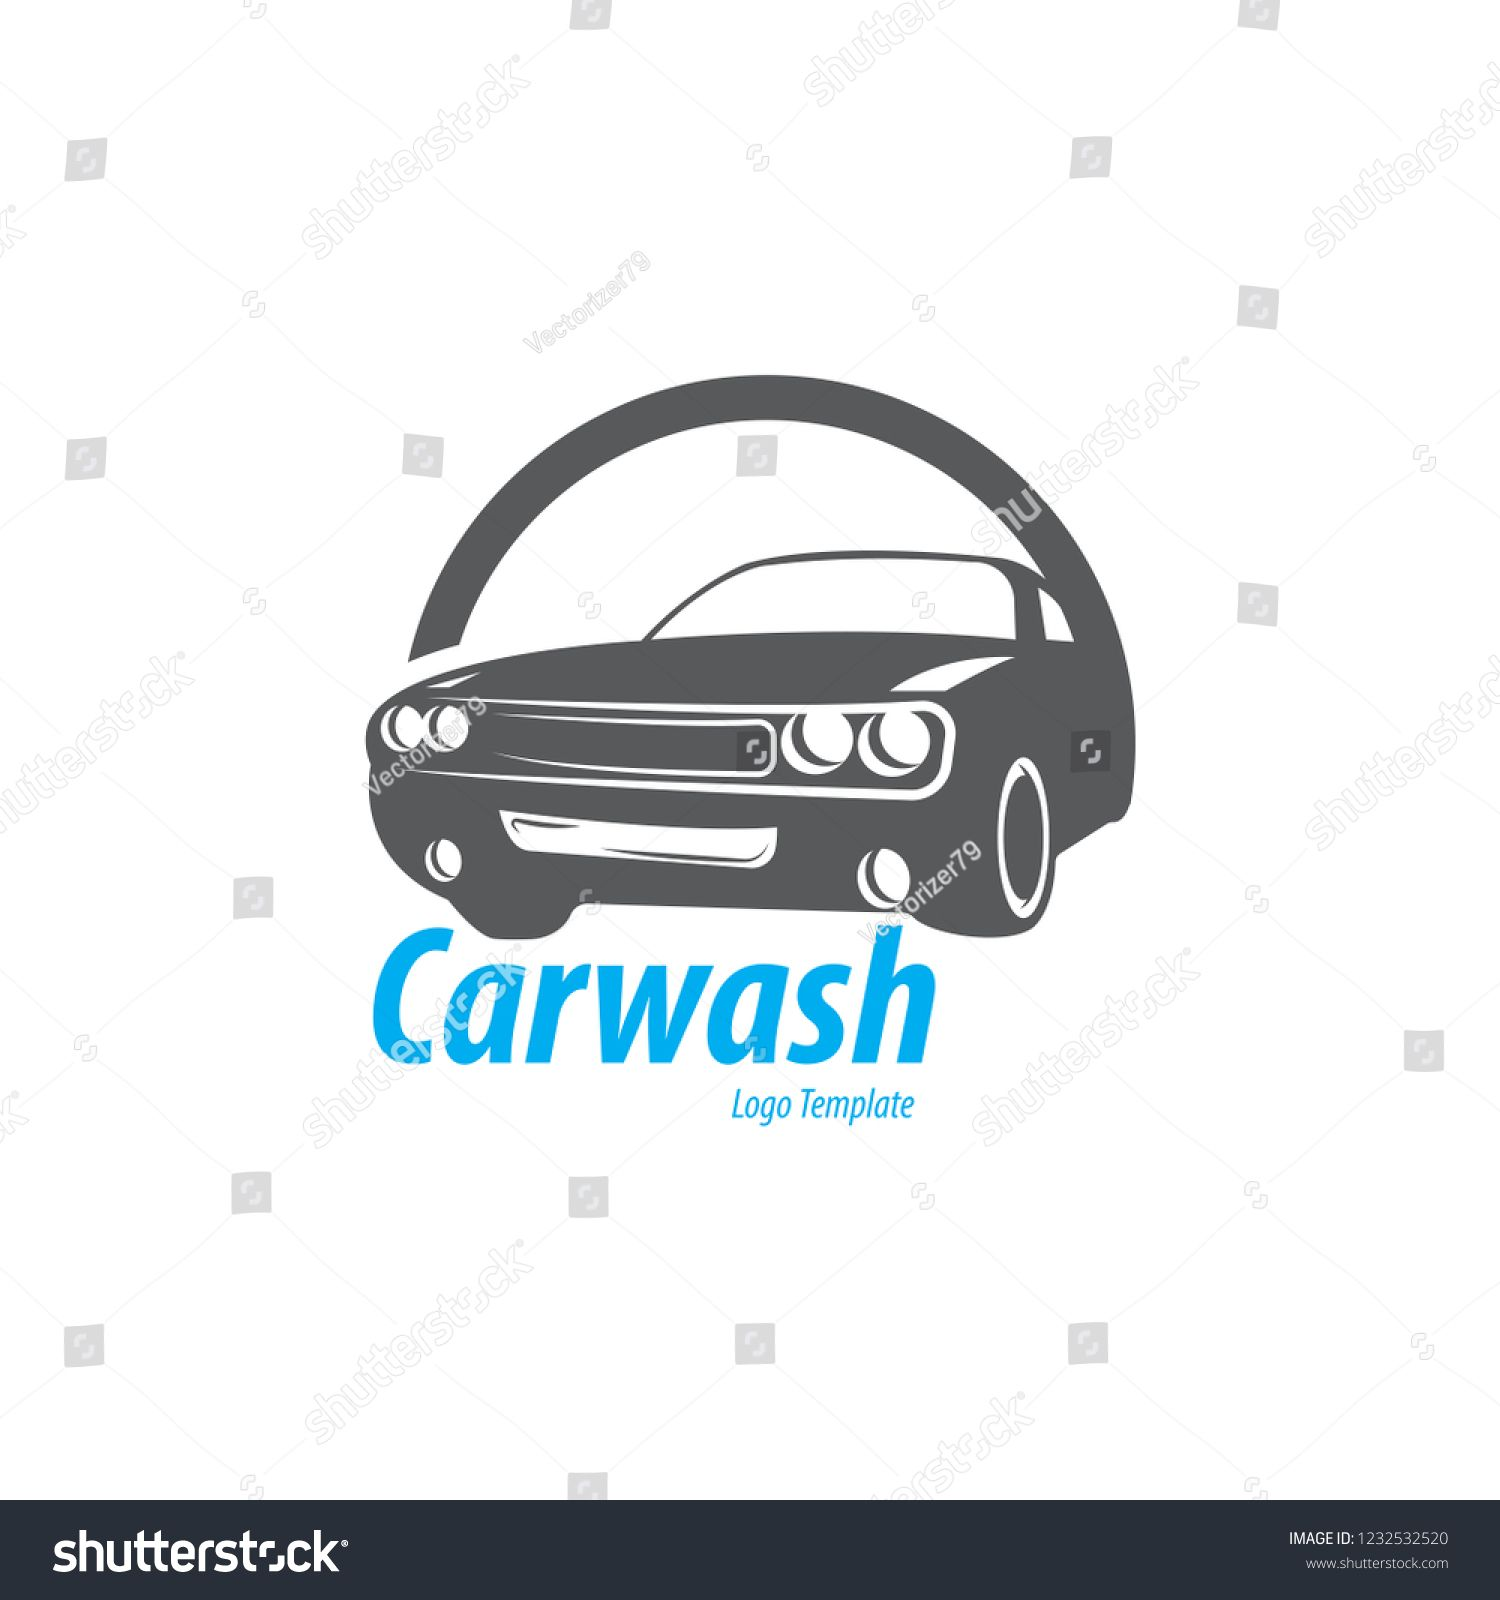 vector image car wash logo Shutterstock